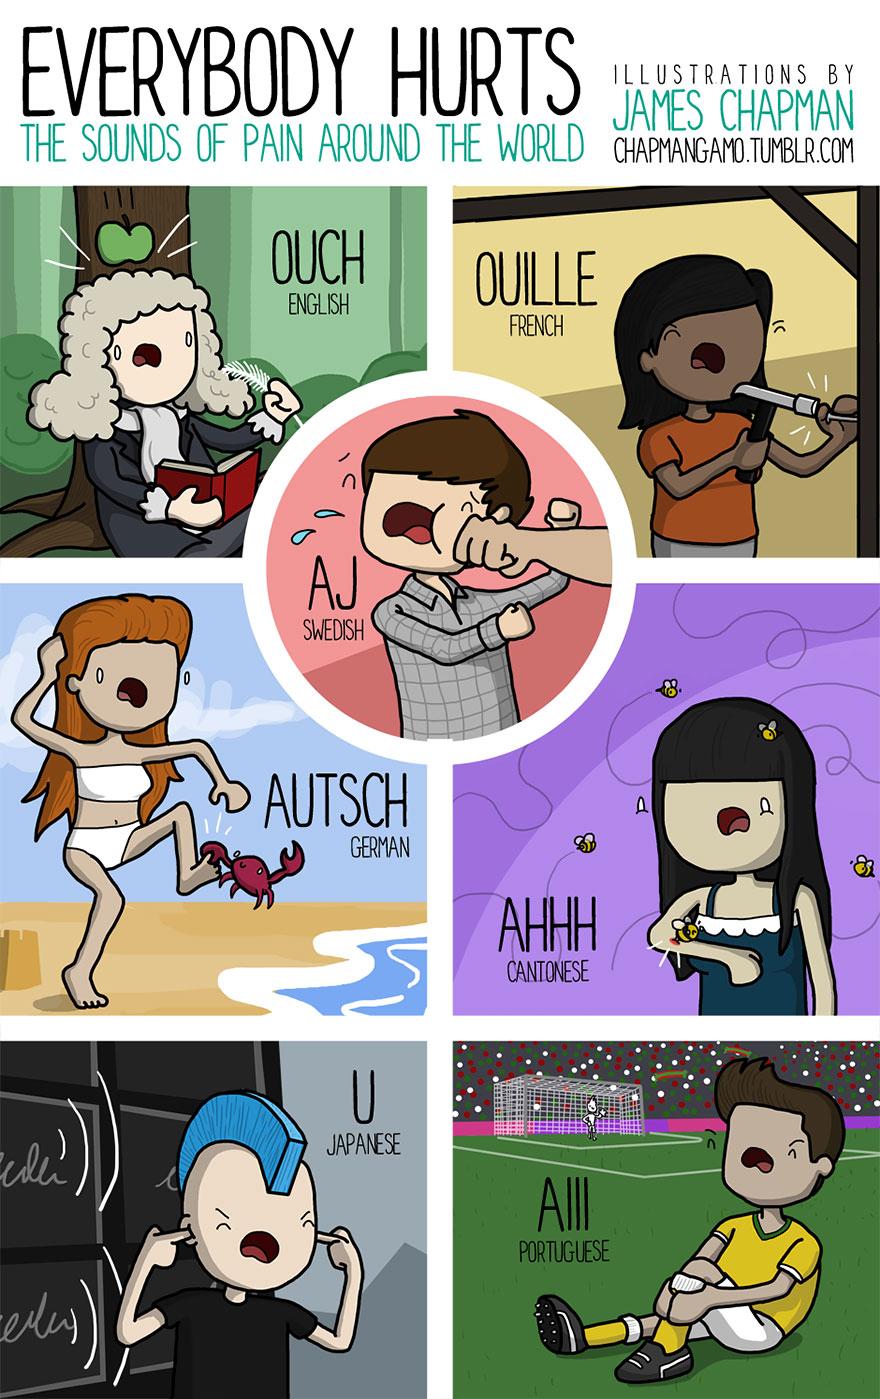 different-languages-expressions-illustrations-james-chapman-21